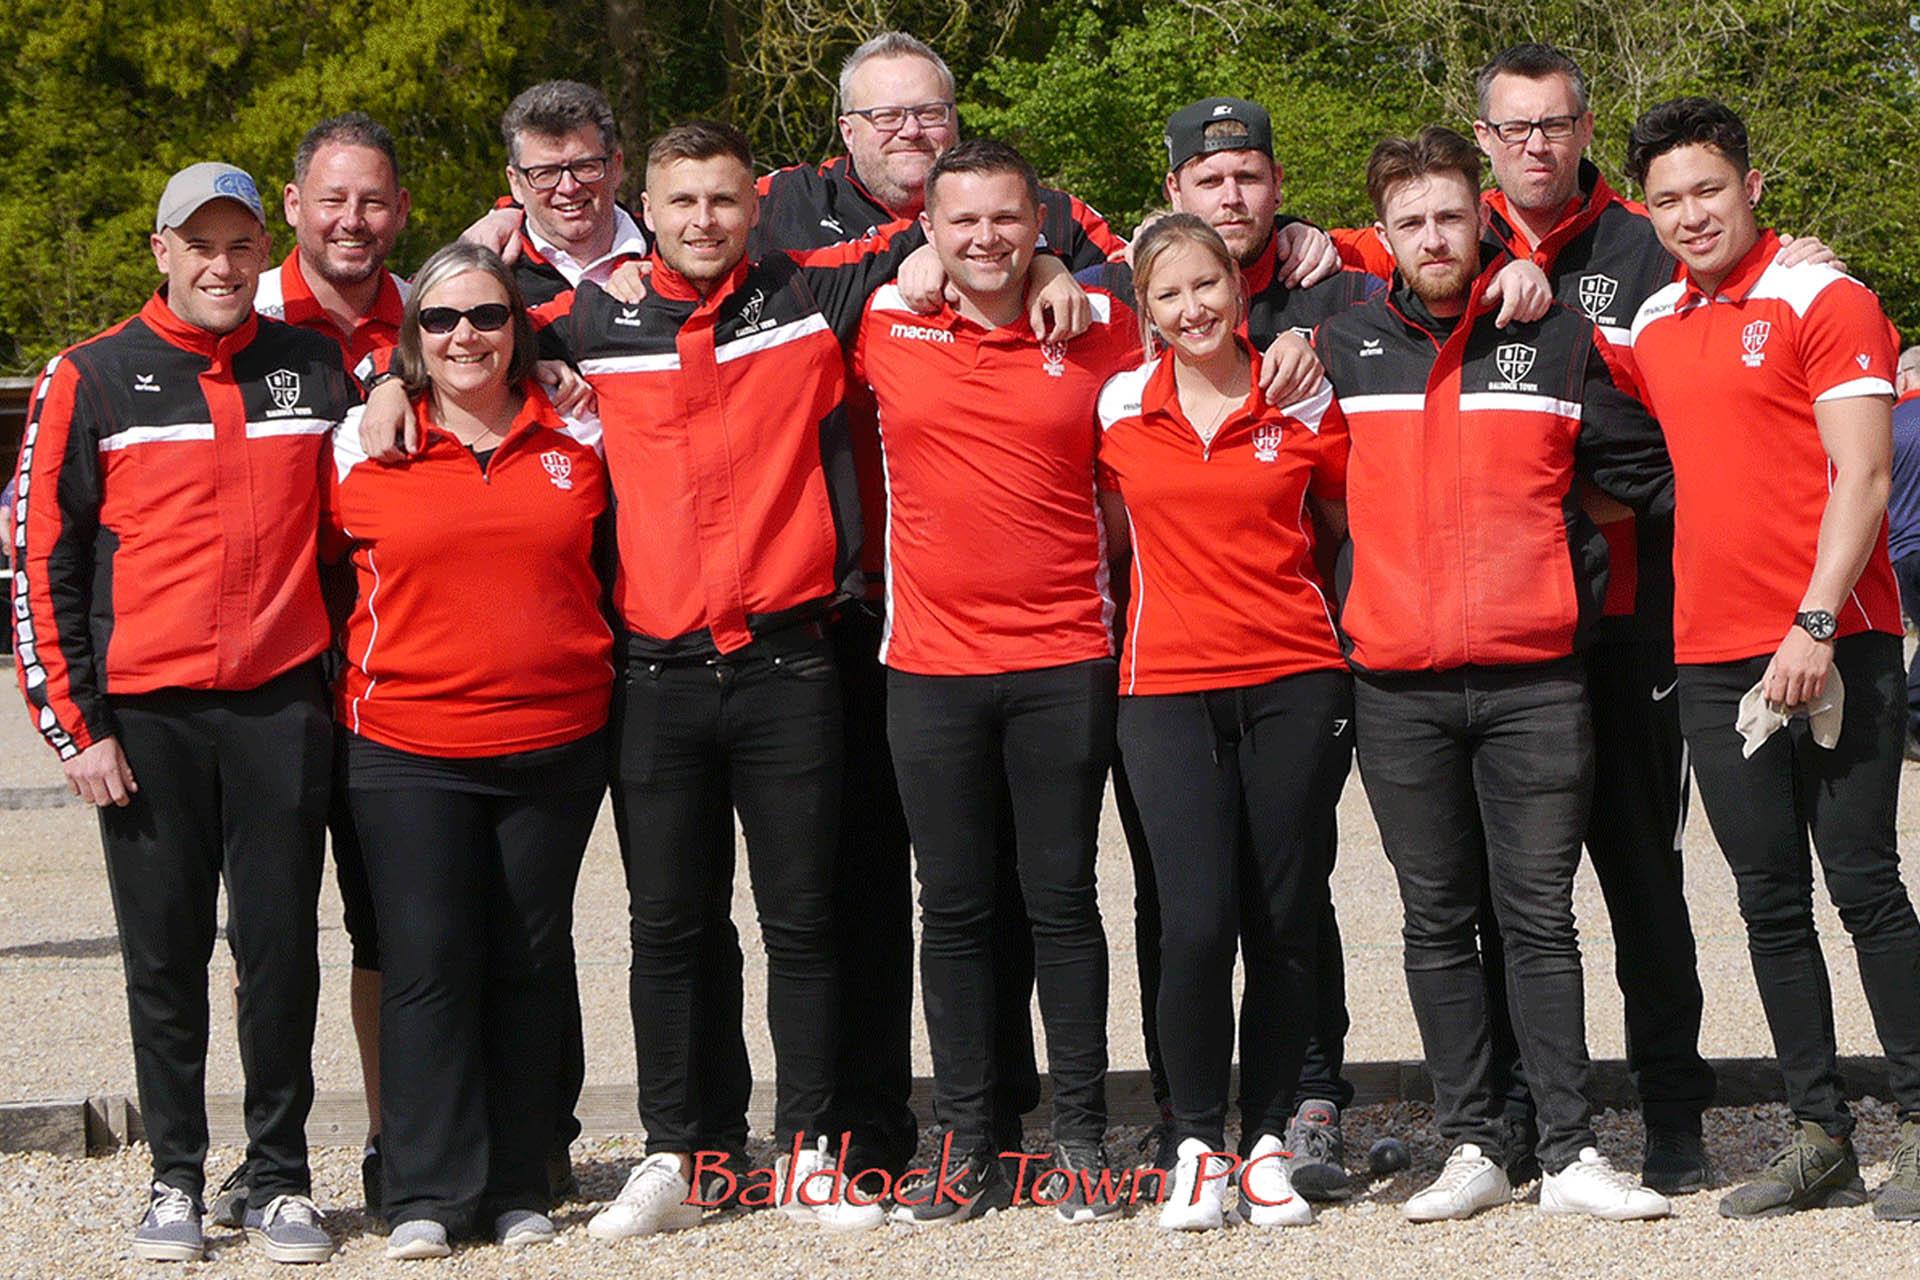 Baldock Town team 2019